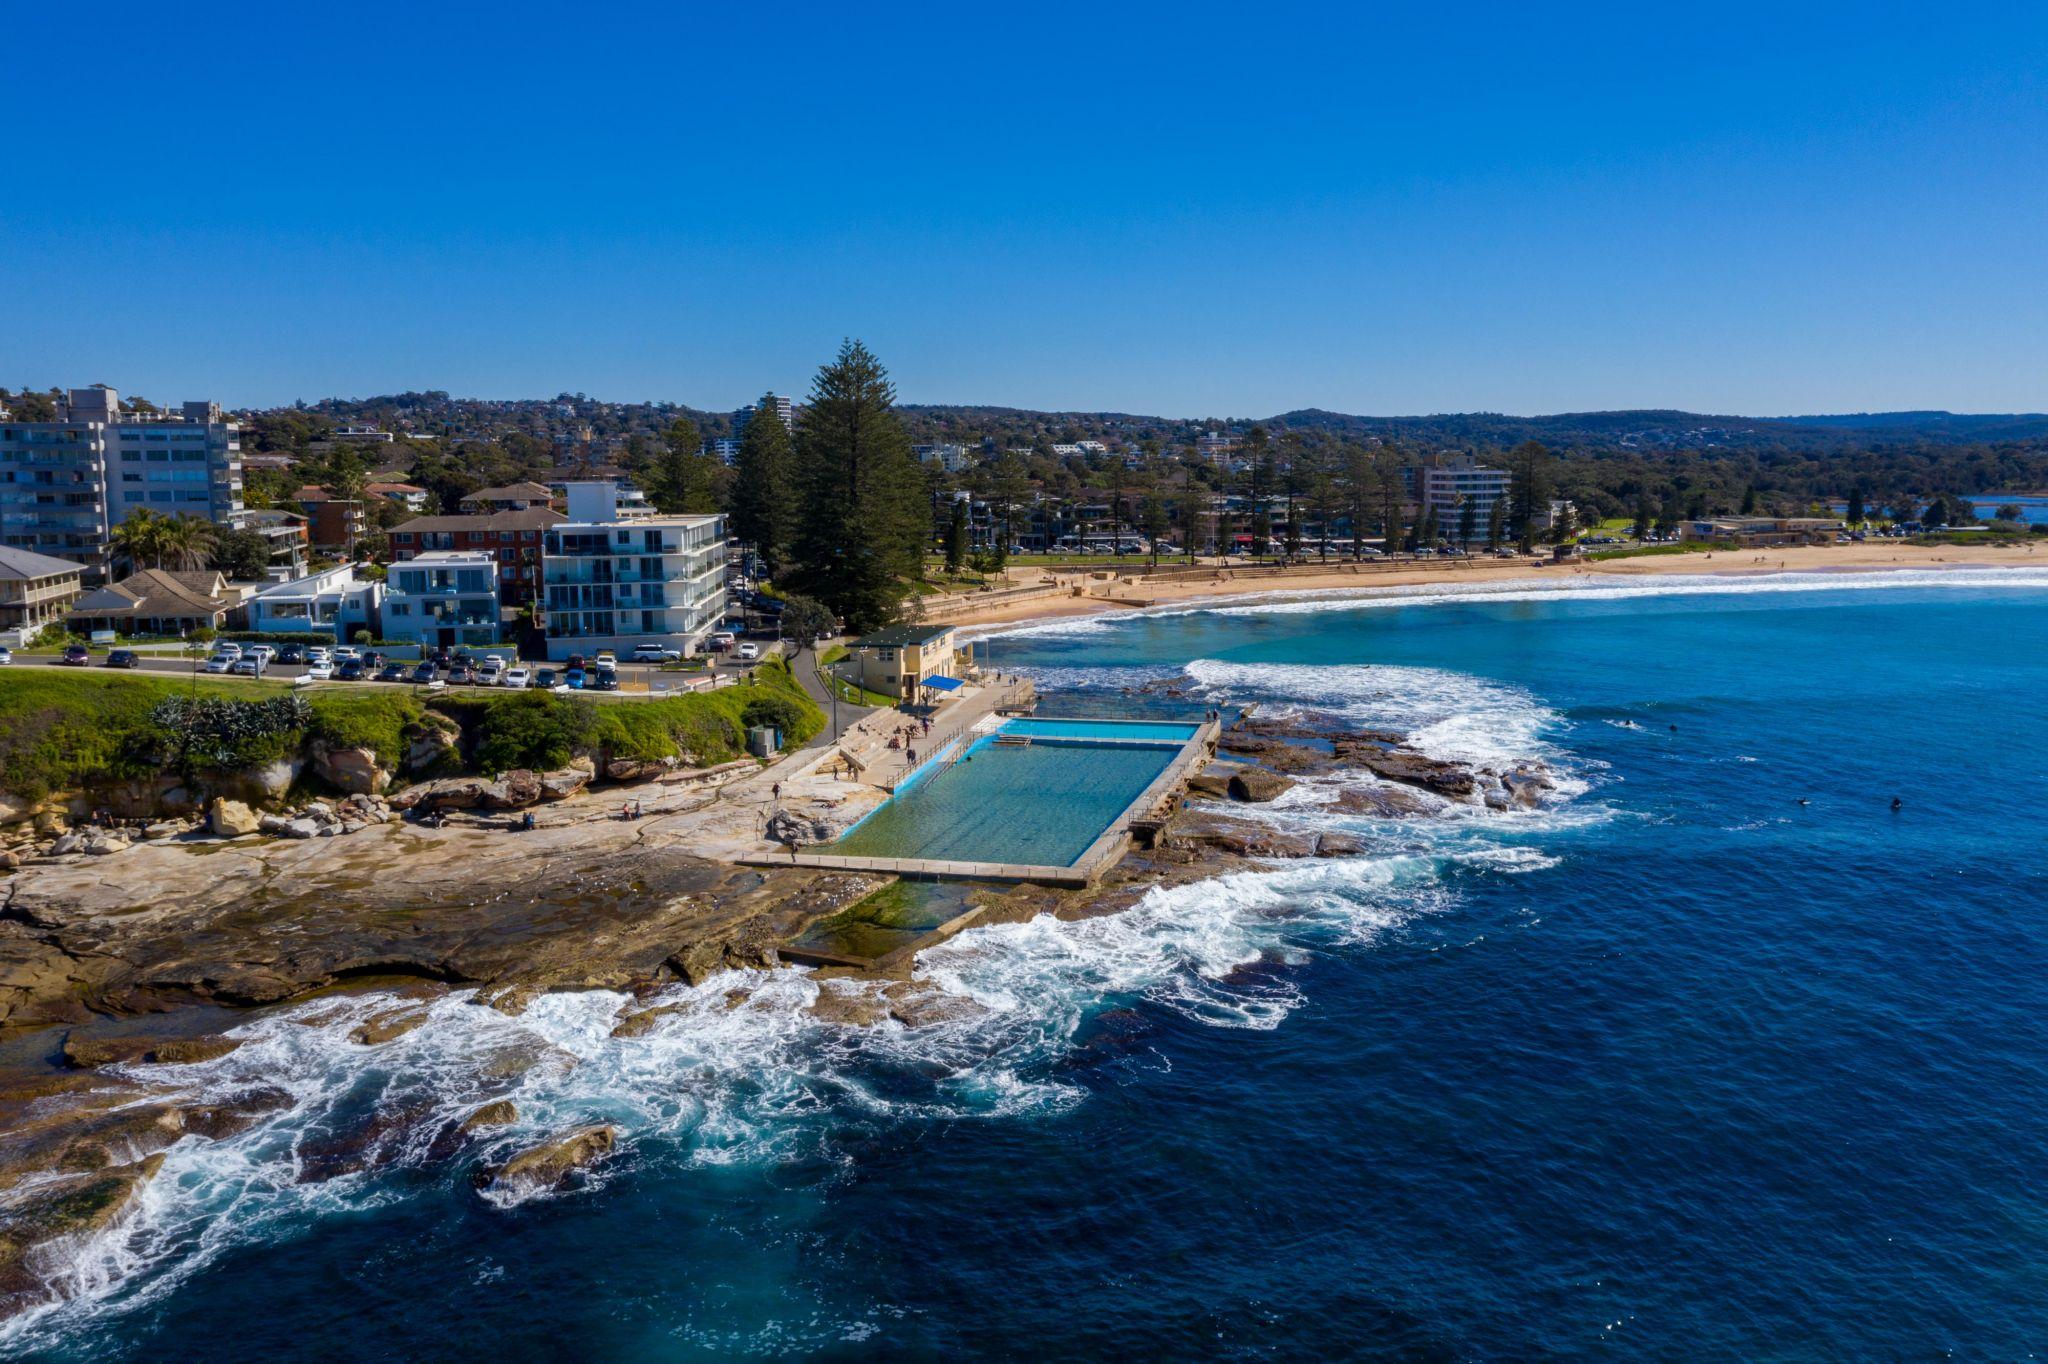 Ocean Pool Dee Why Northern Beaches Sydney NSW, Australia